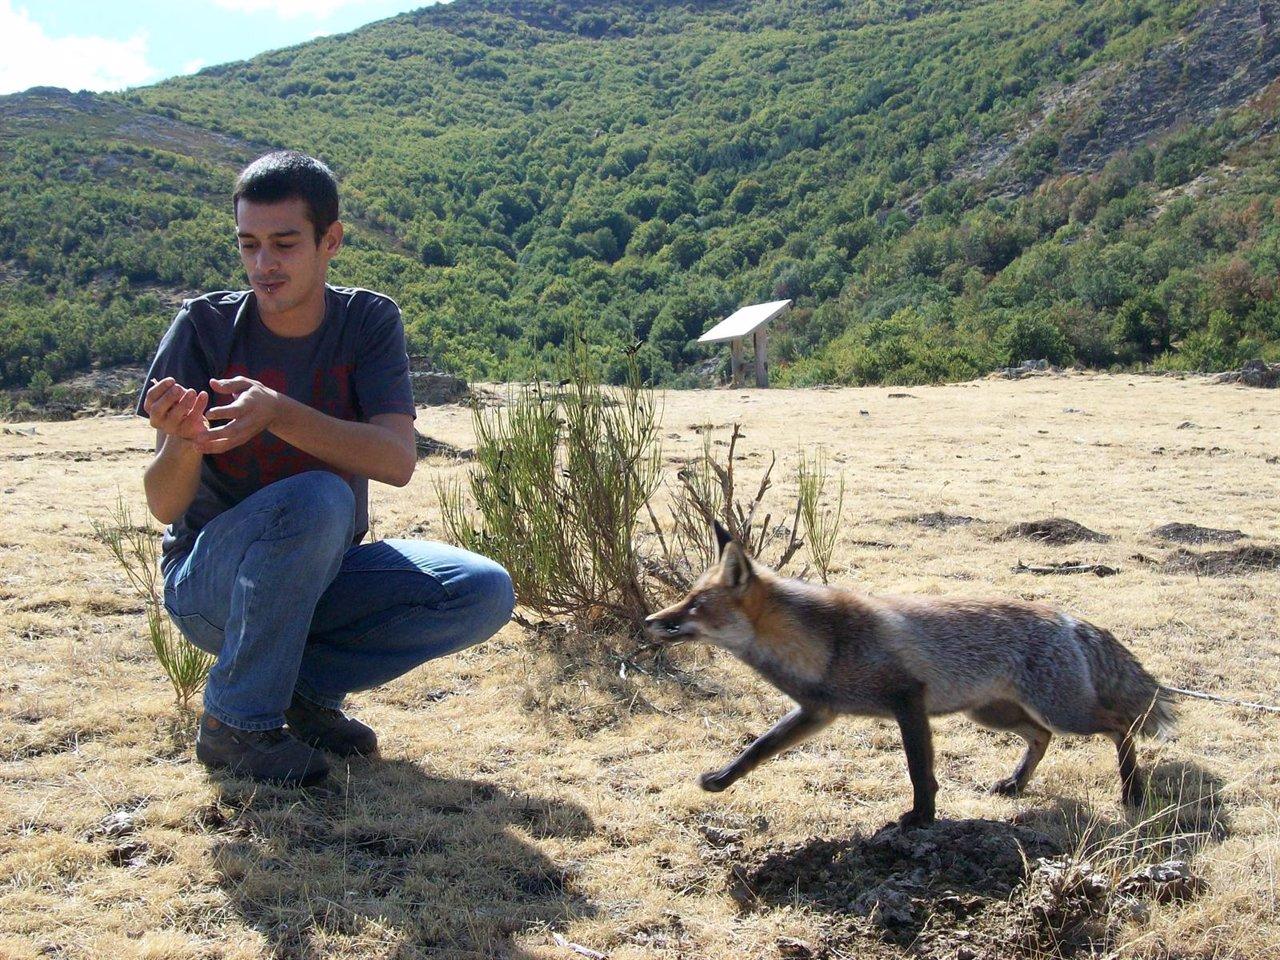 El joven investigador Ciro Cabal  examina un zorro